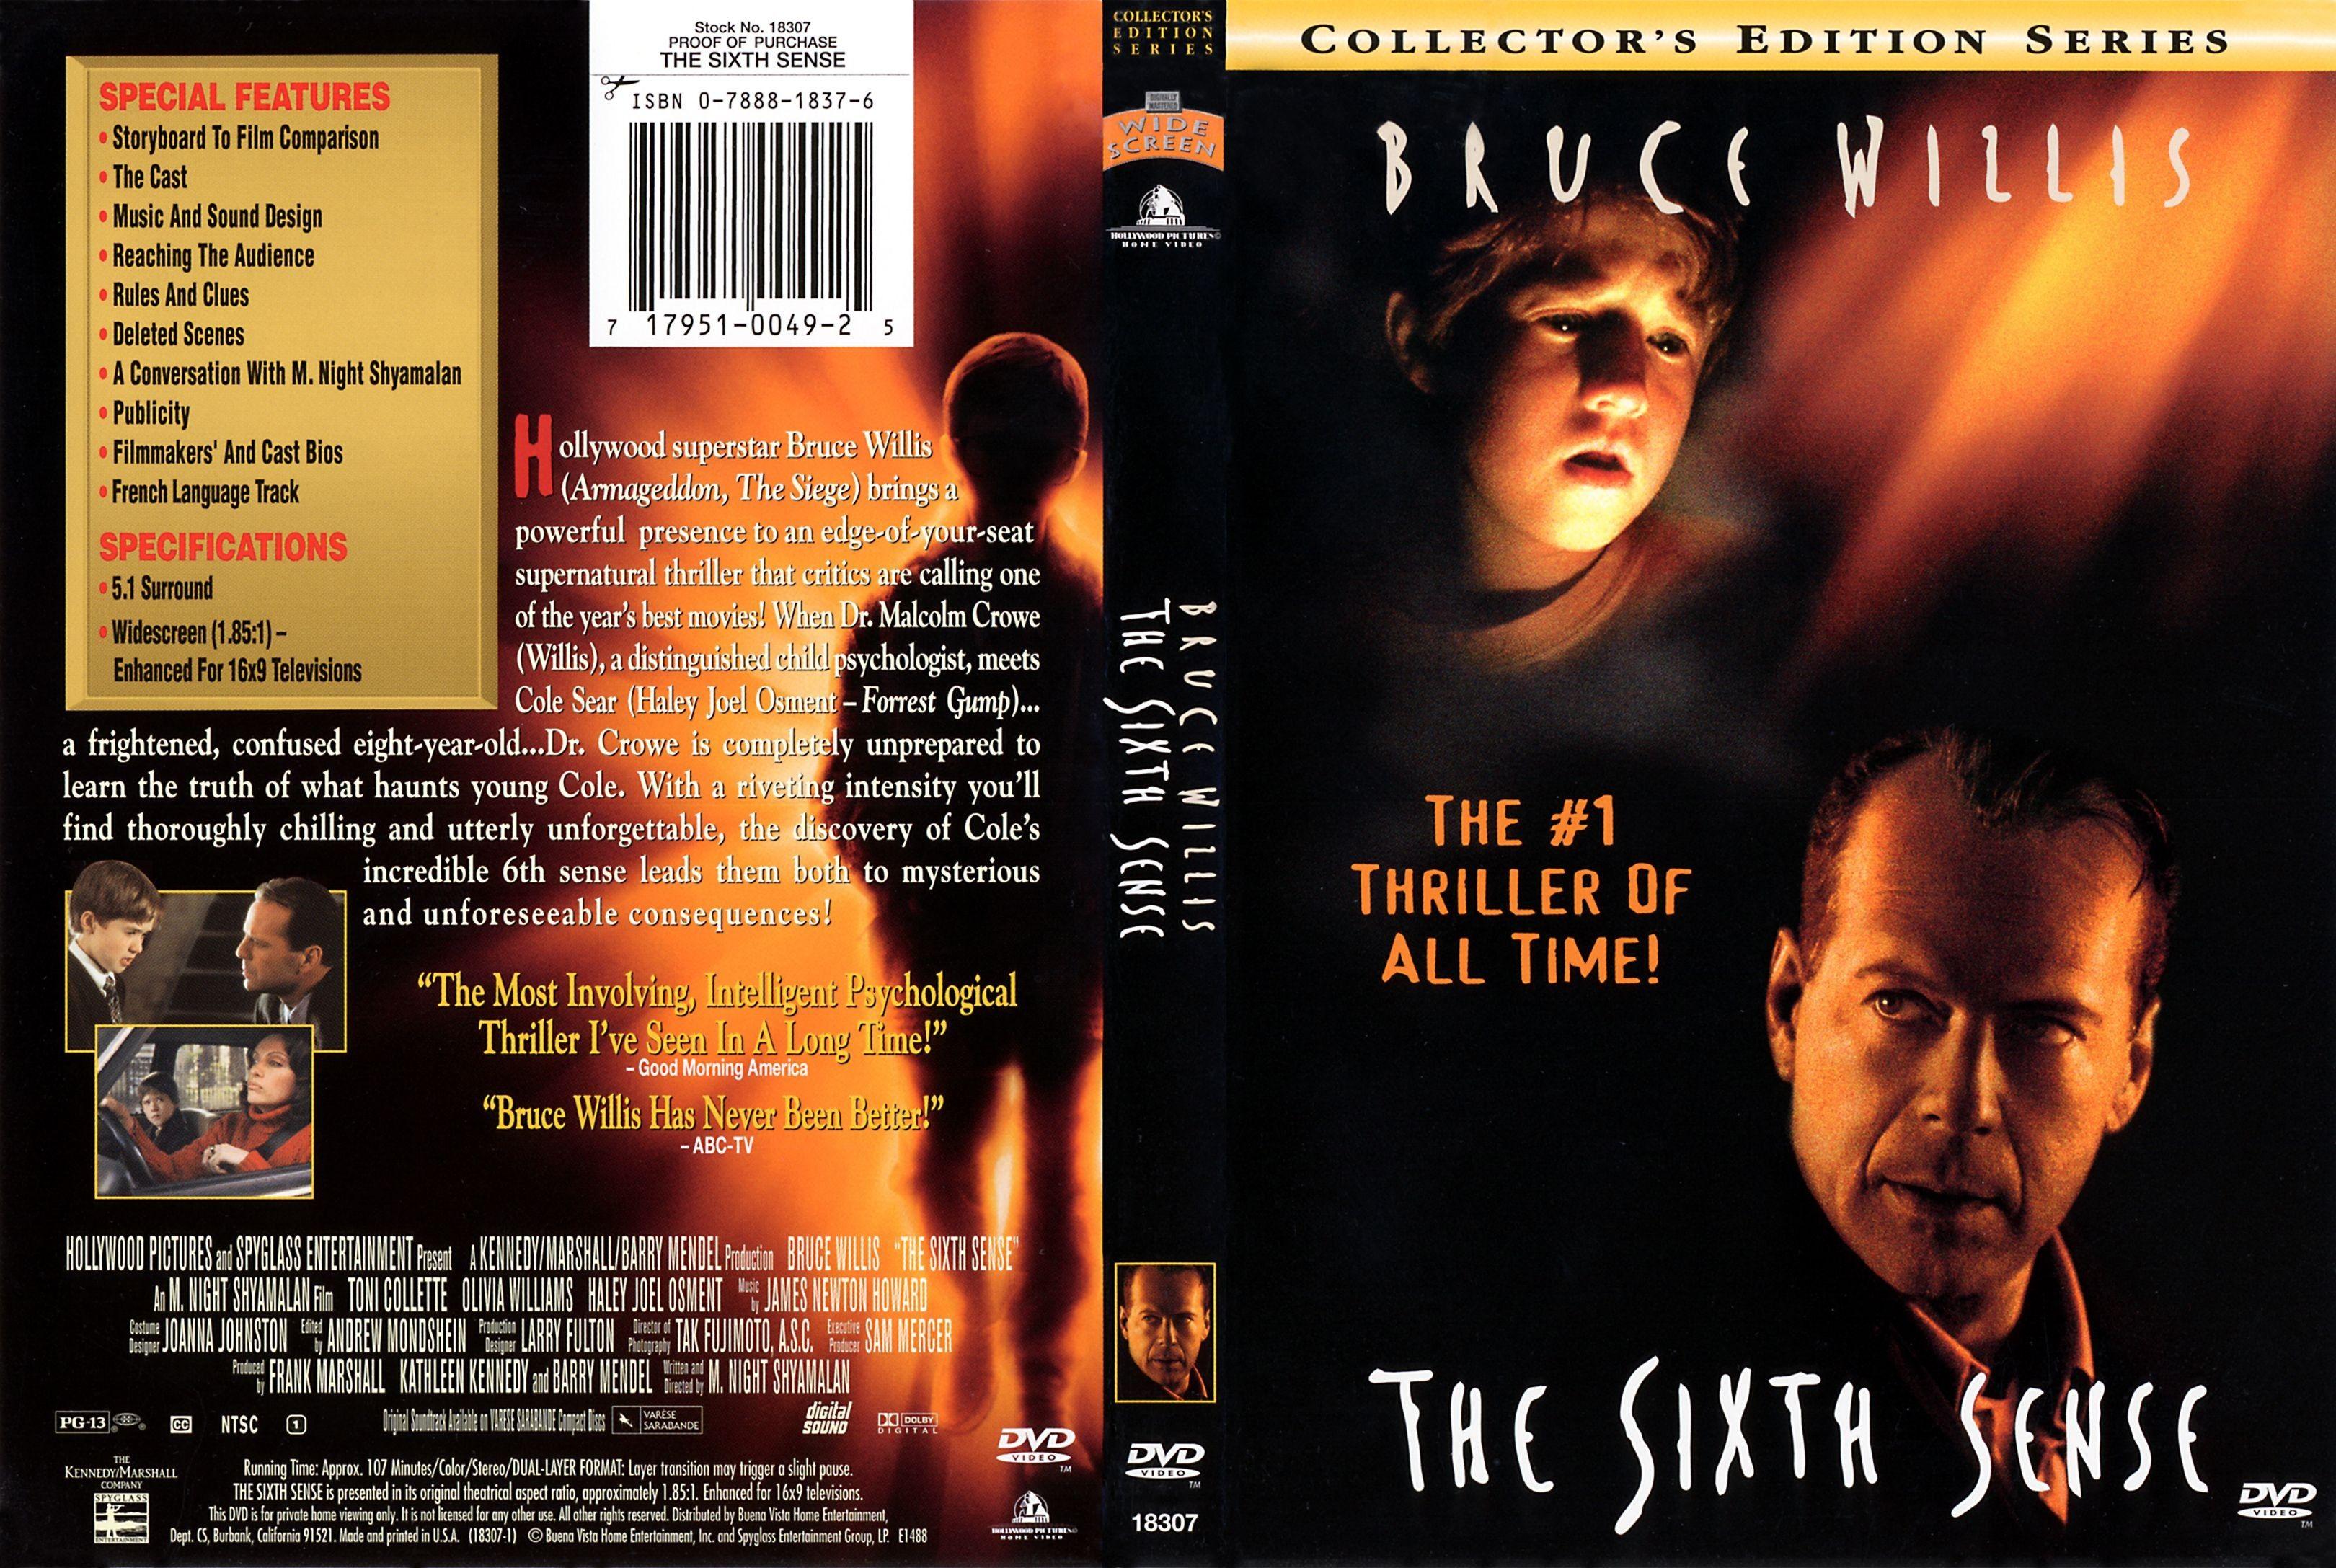 The Sixth Sense 1999 Avaxhome